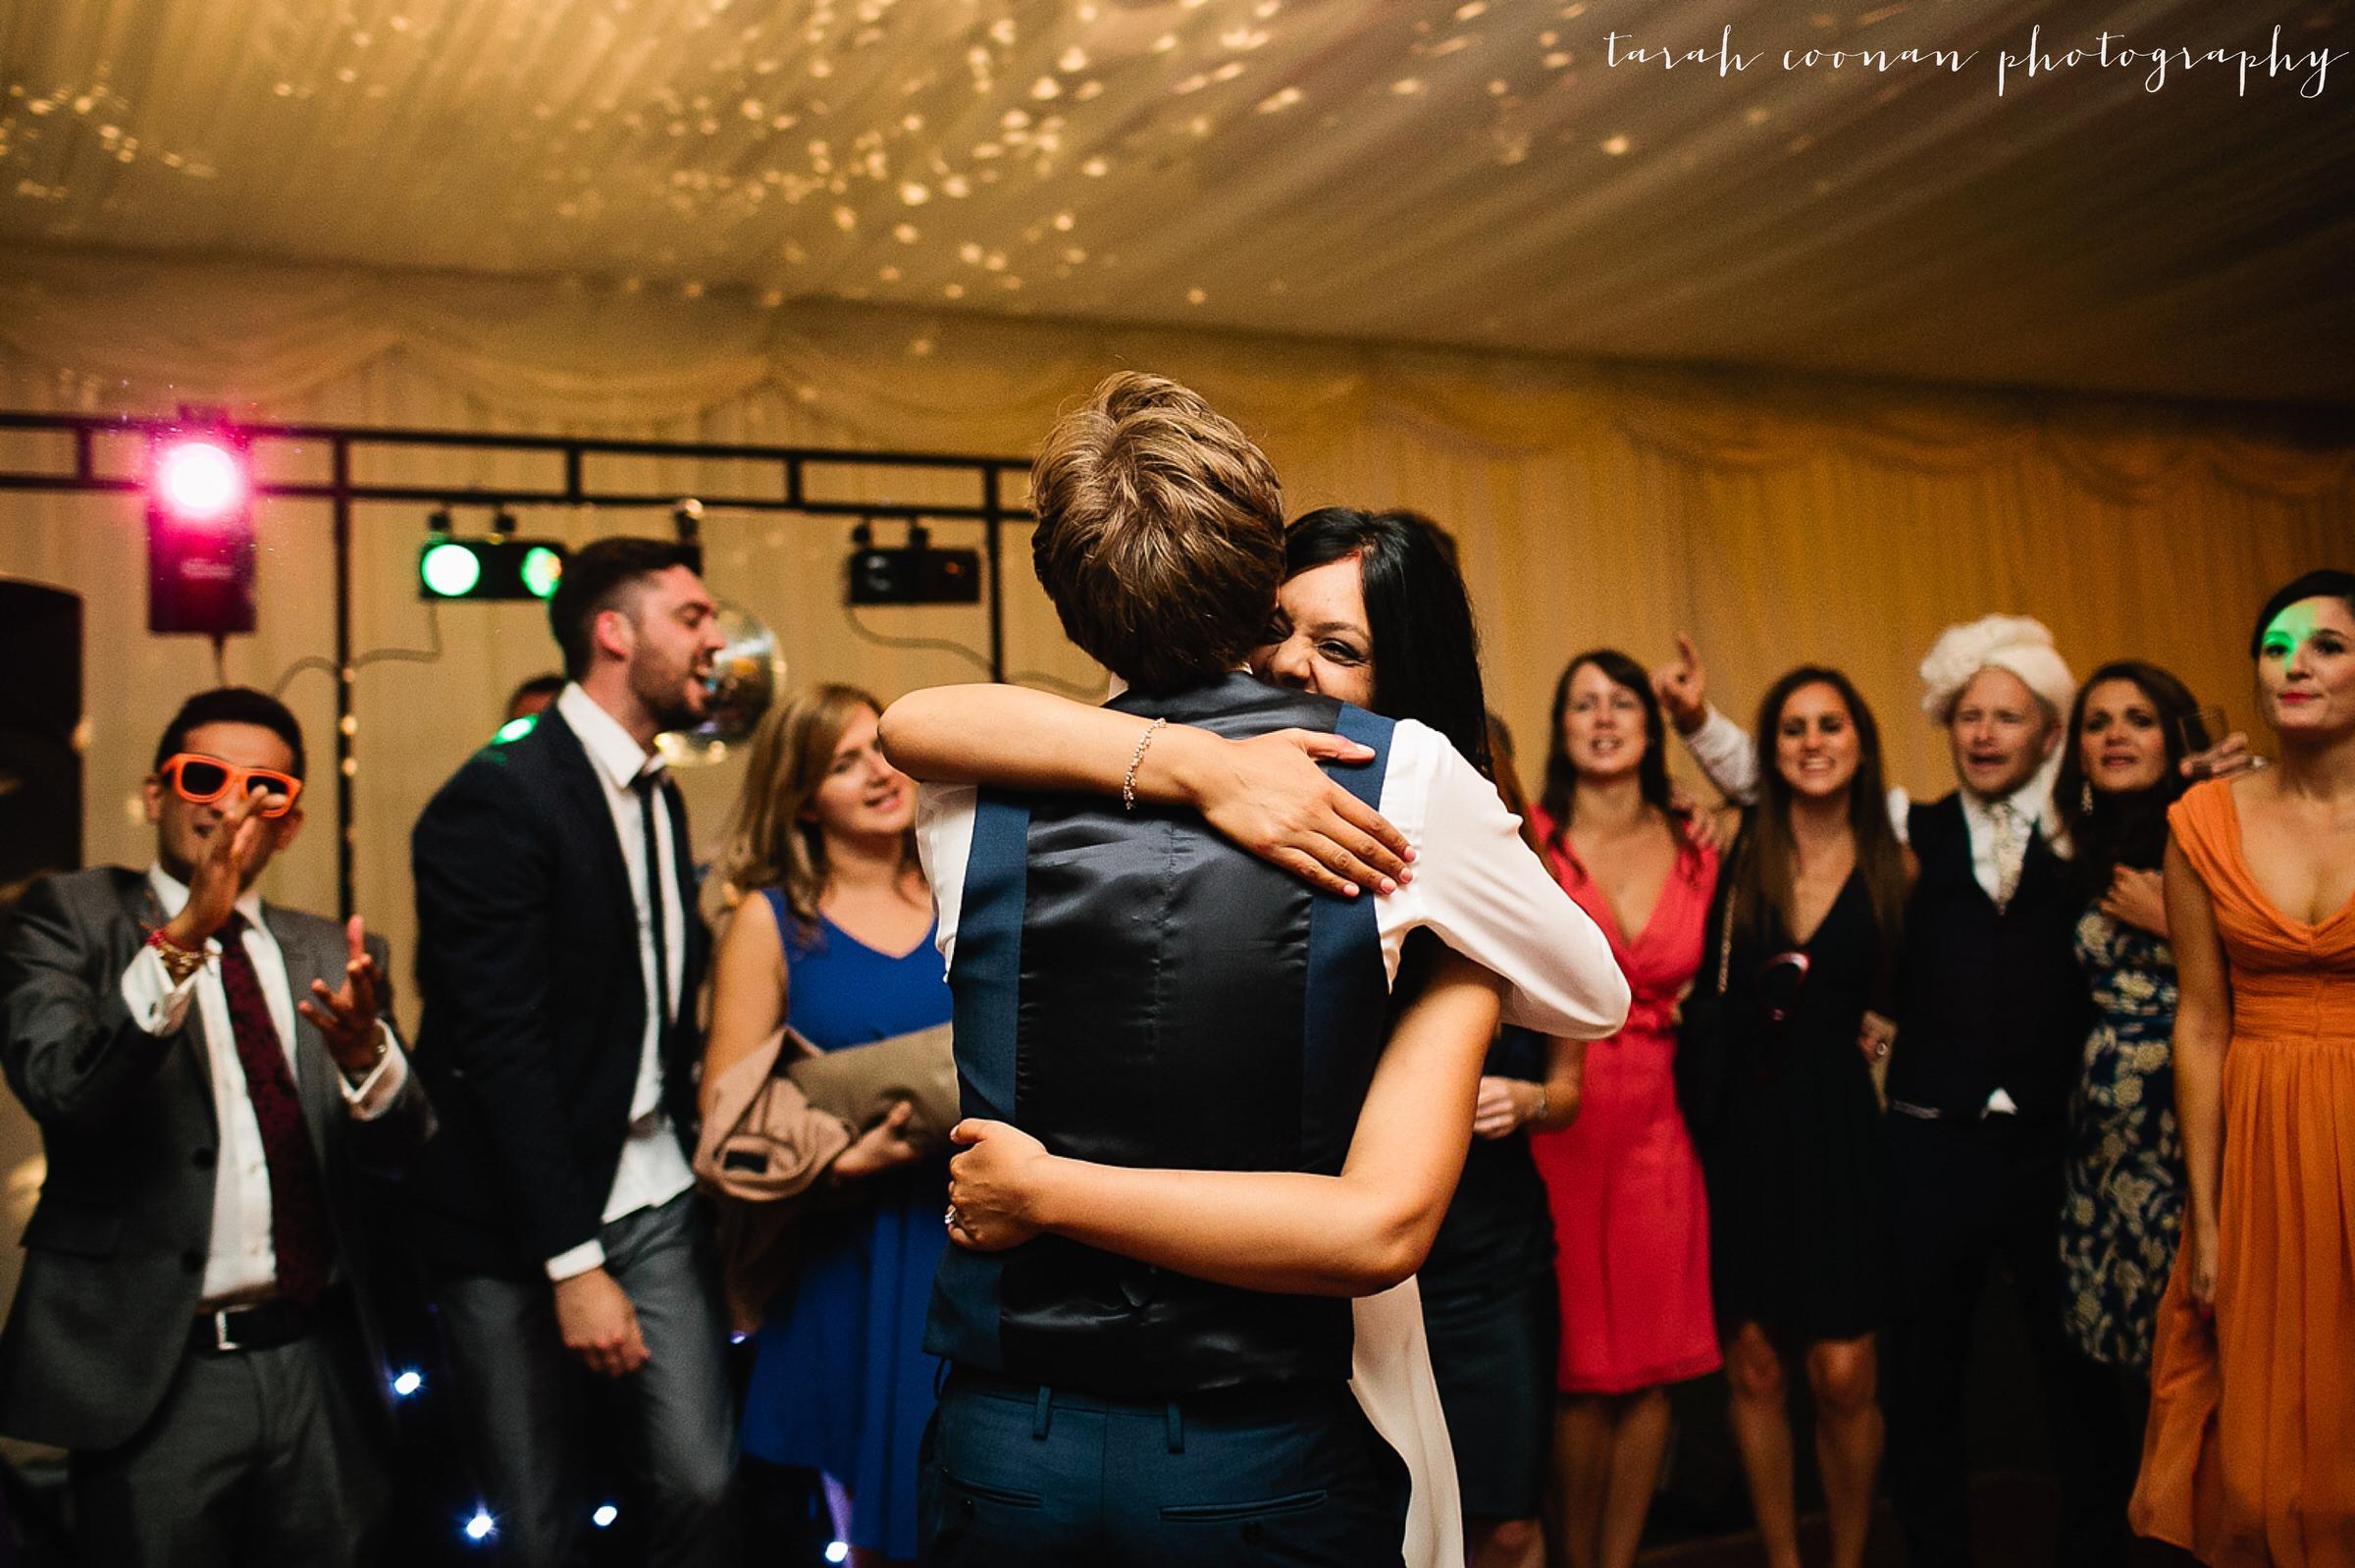 asian-wedding-photography-london_103